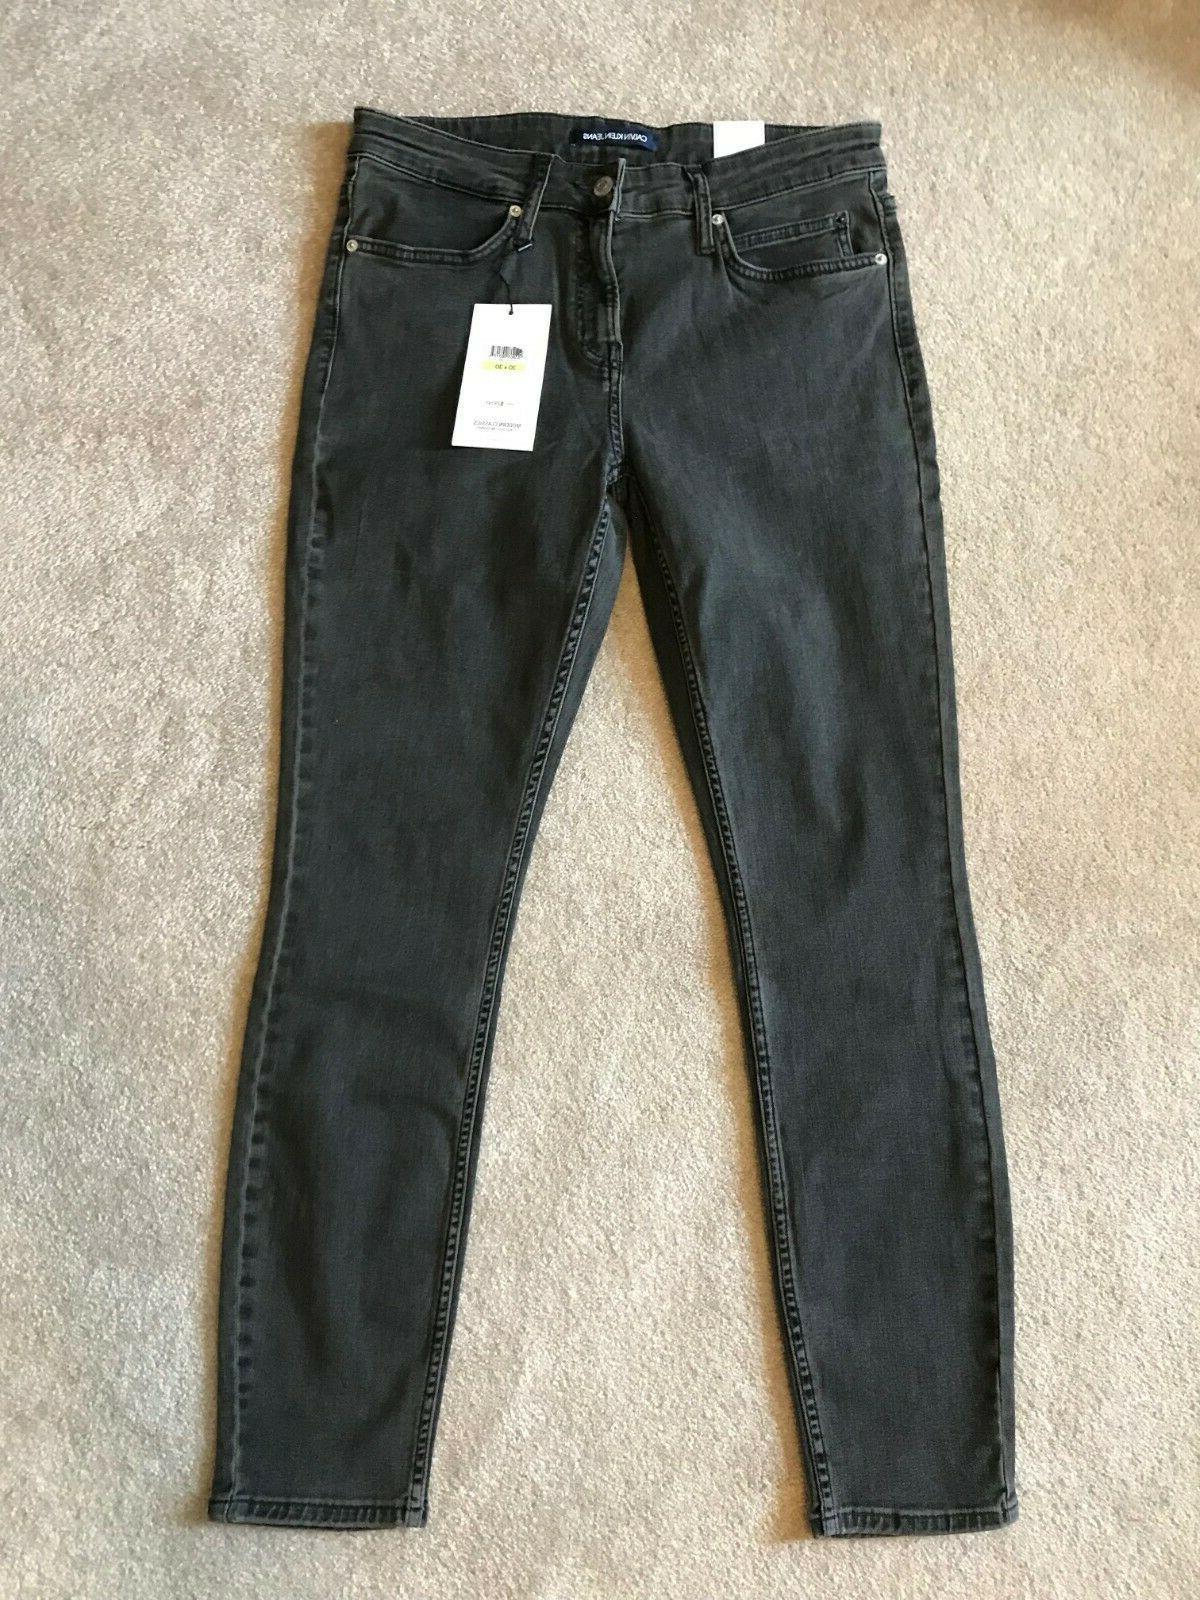 Men's Calvin Klein $40 OFF x Rise Skinny Black $79.50